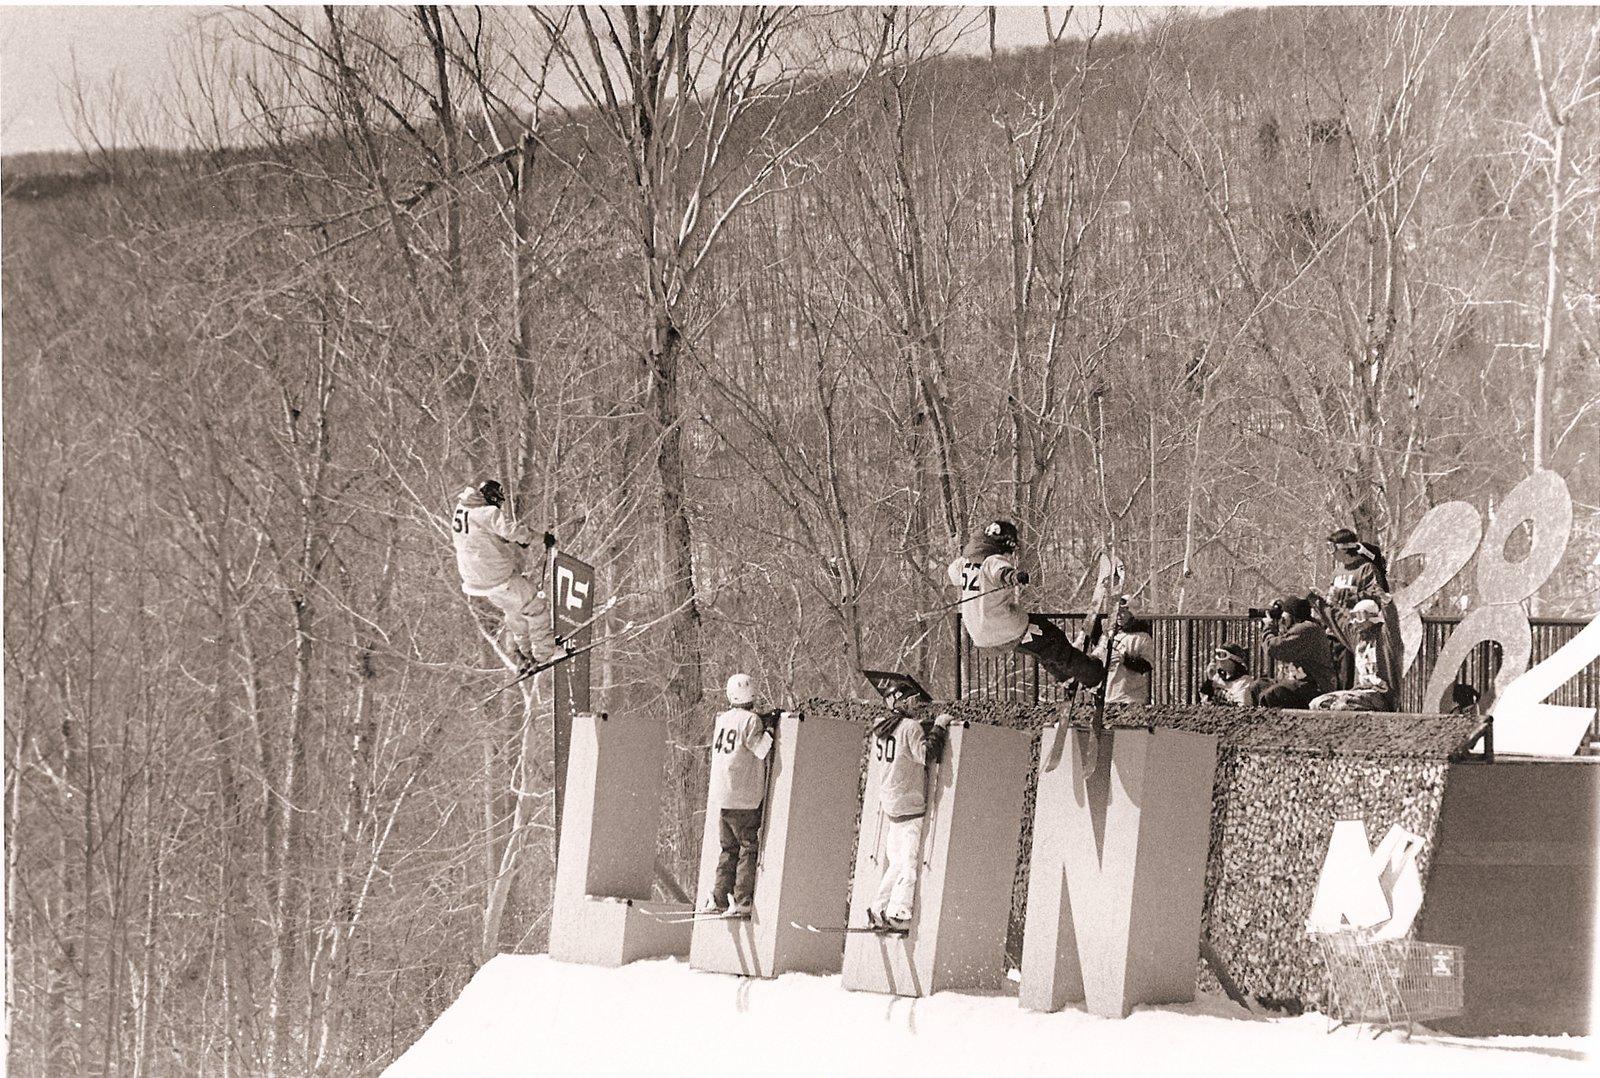 Battle my crew - ski block